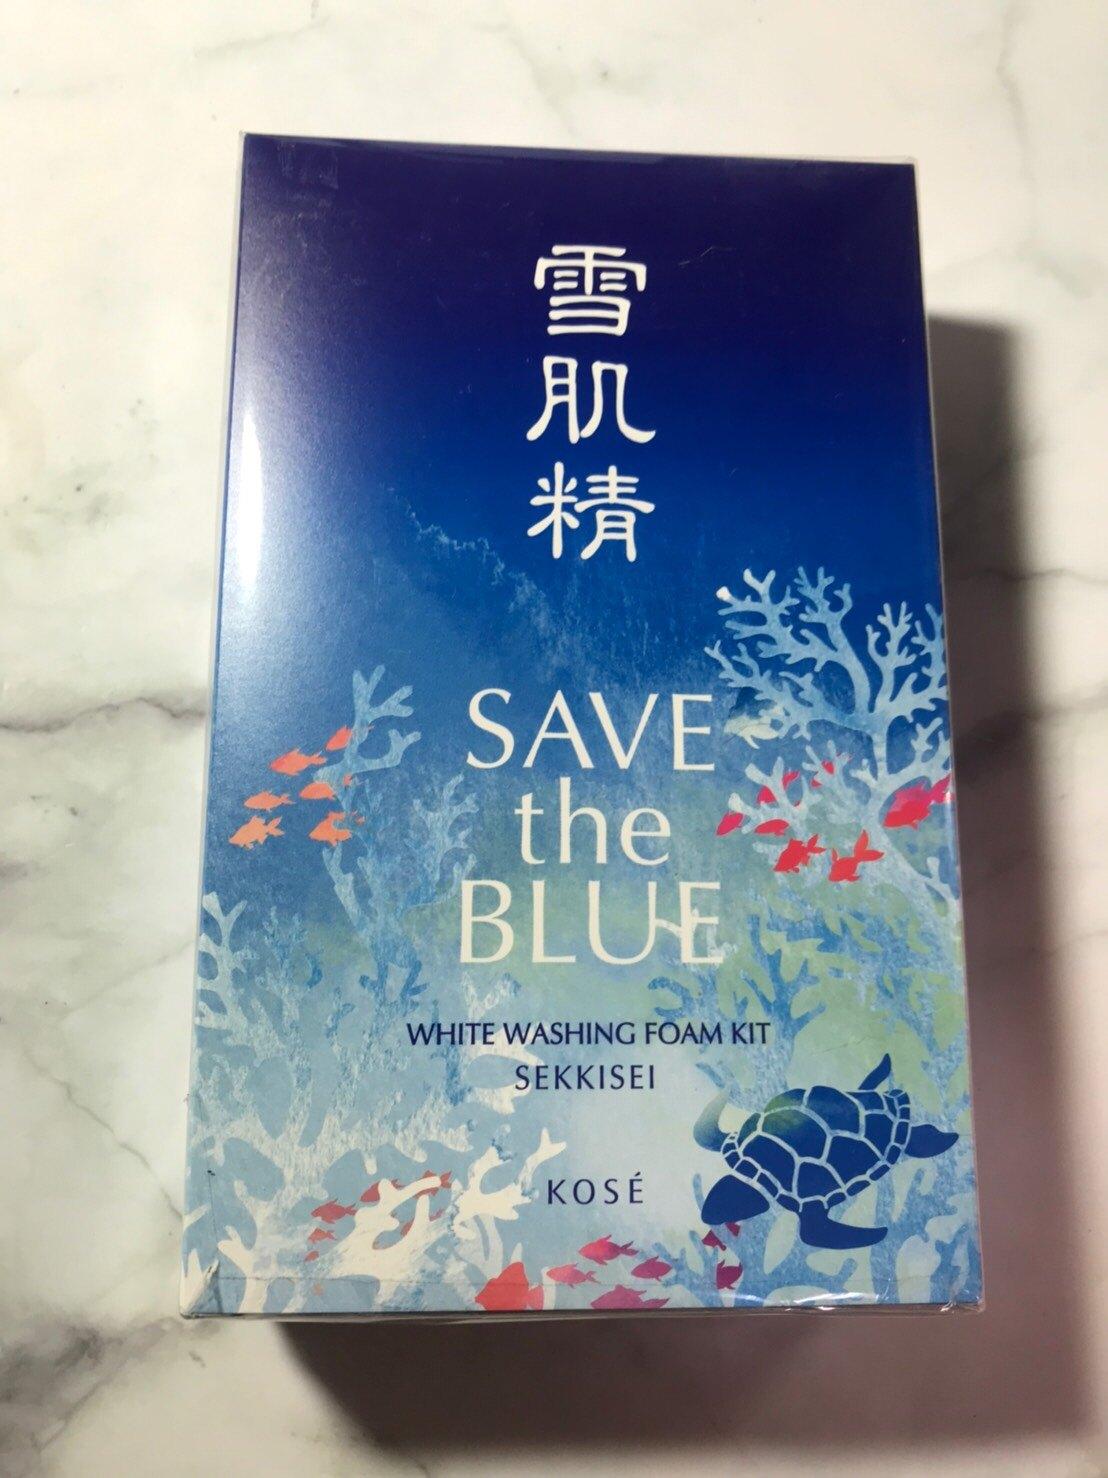 【KOSE 高絲】雪肌精 淨透洗顏霜 Save the Blue 珍愛海洋版(淨透洗顏霜130g+藥用雪肌精24ml)